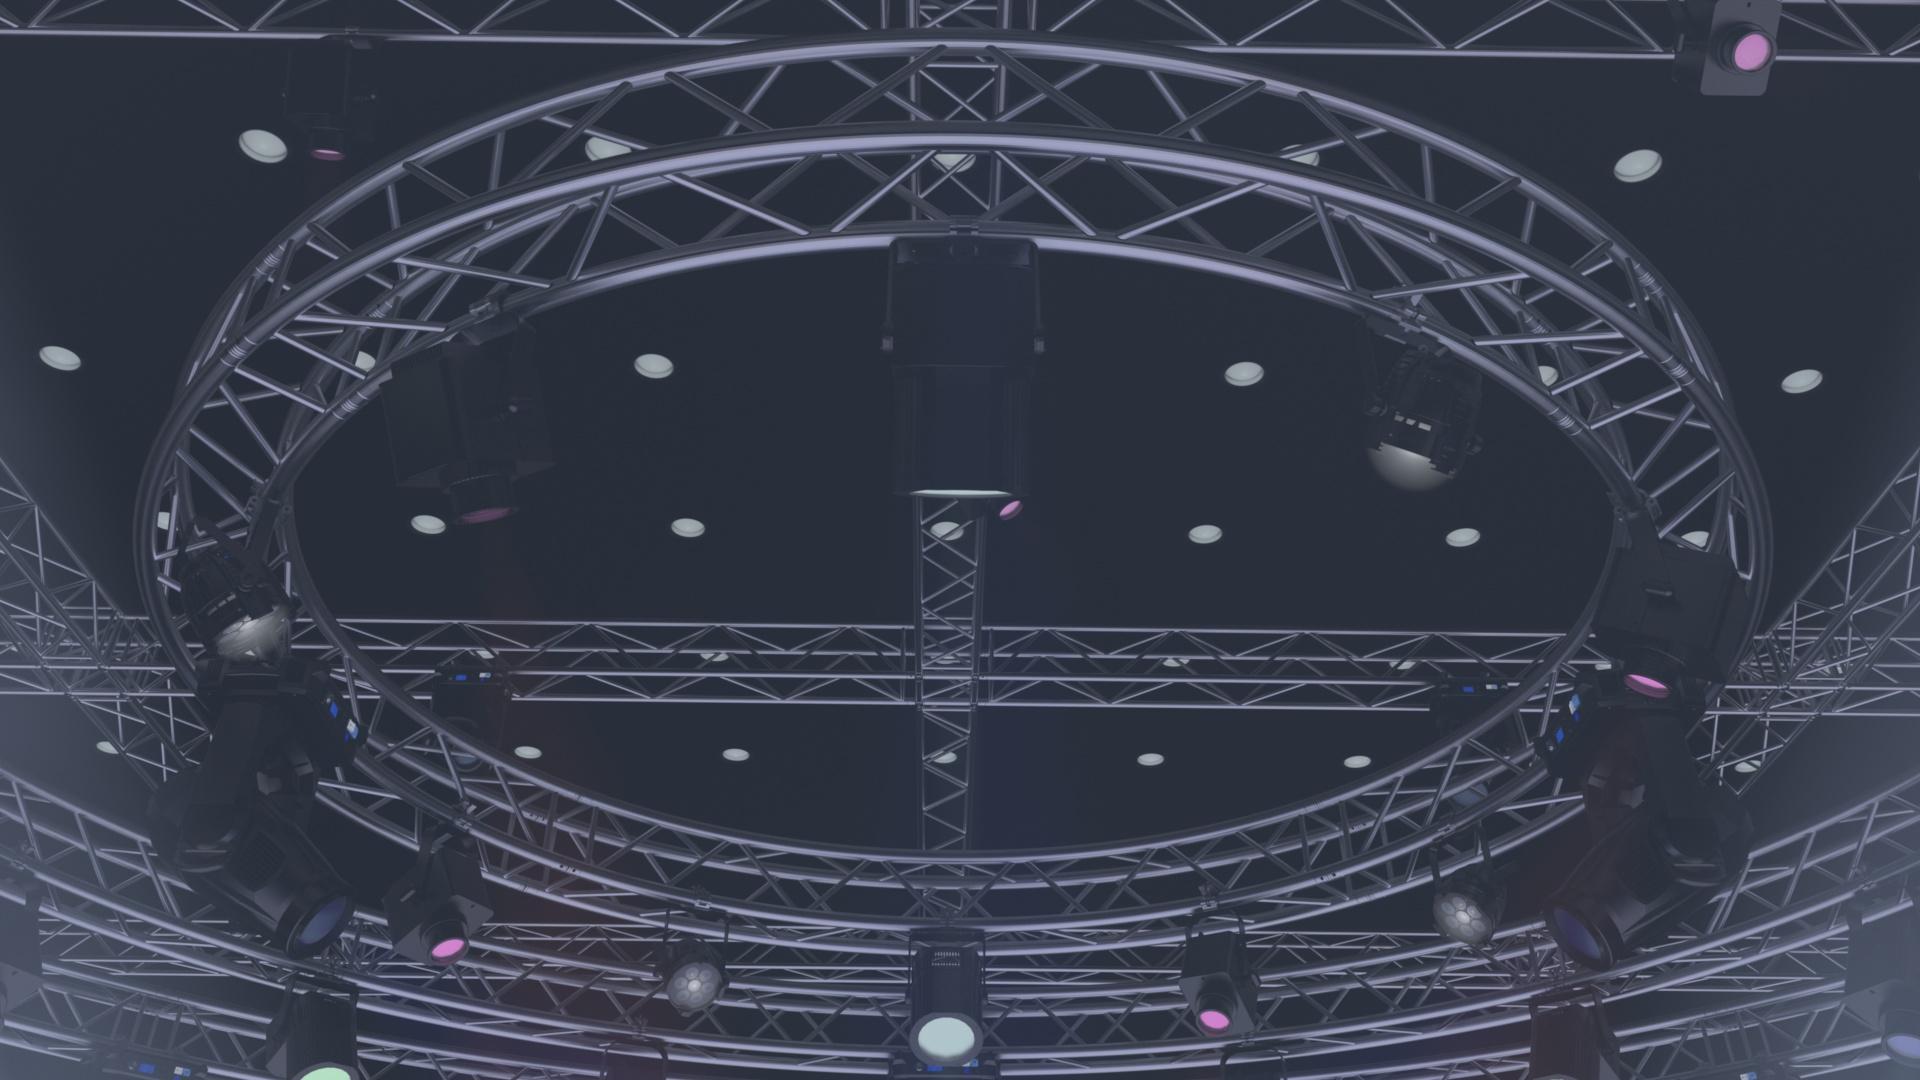 41-01-TVStudioStage-TrussLights-4a